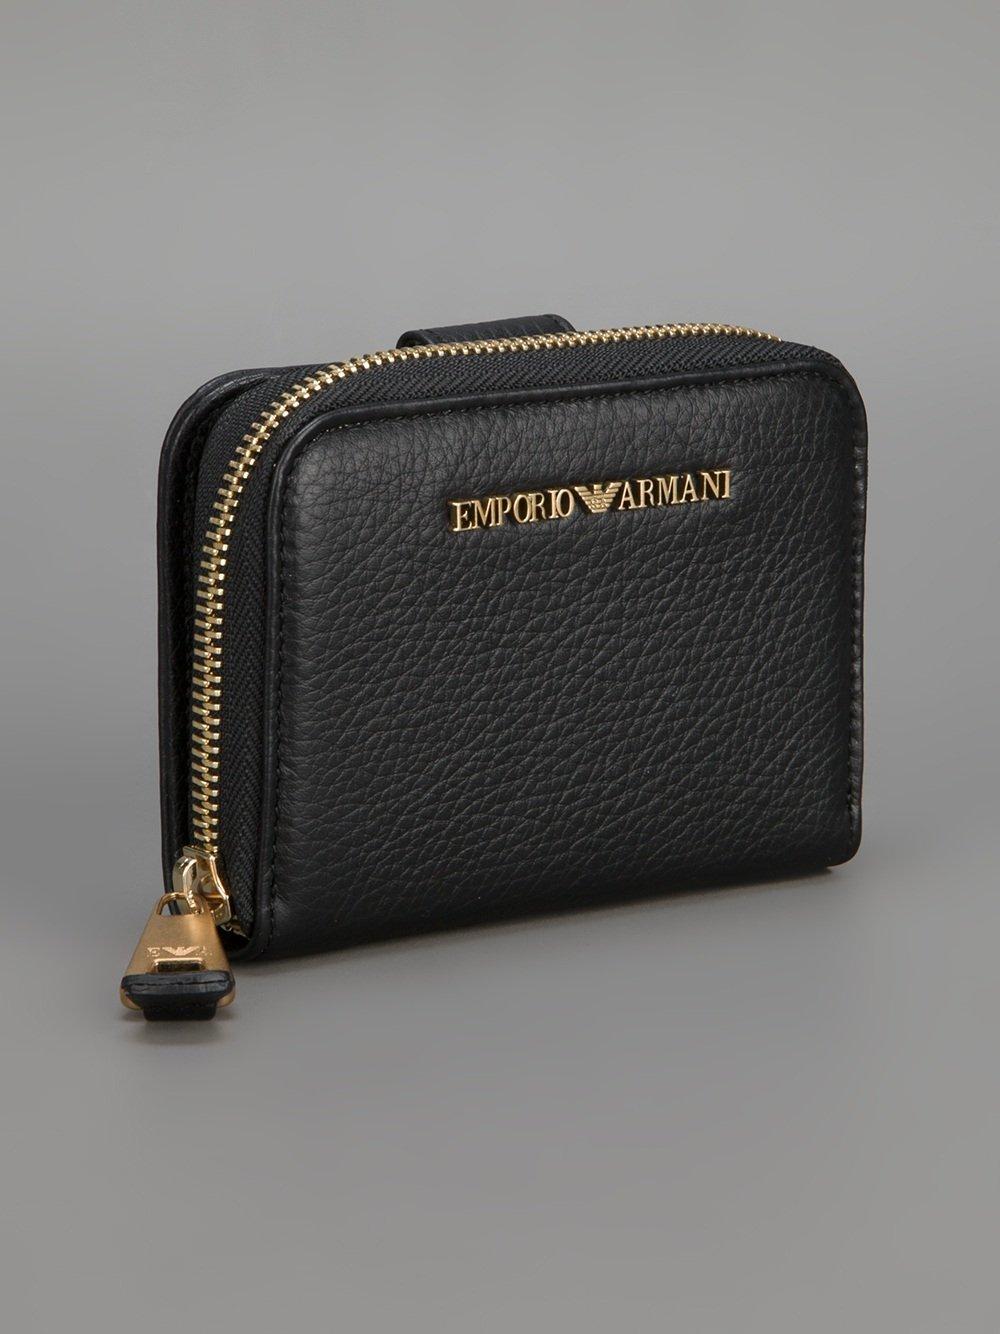 Logo Embossed Leather Zip Coin Purse - Gold Emporio Armani NRyM4ILwOr